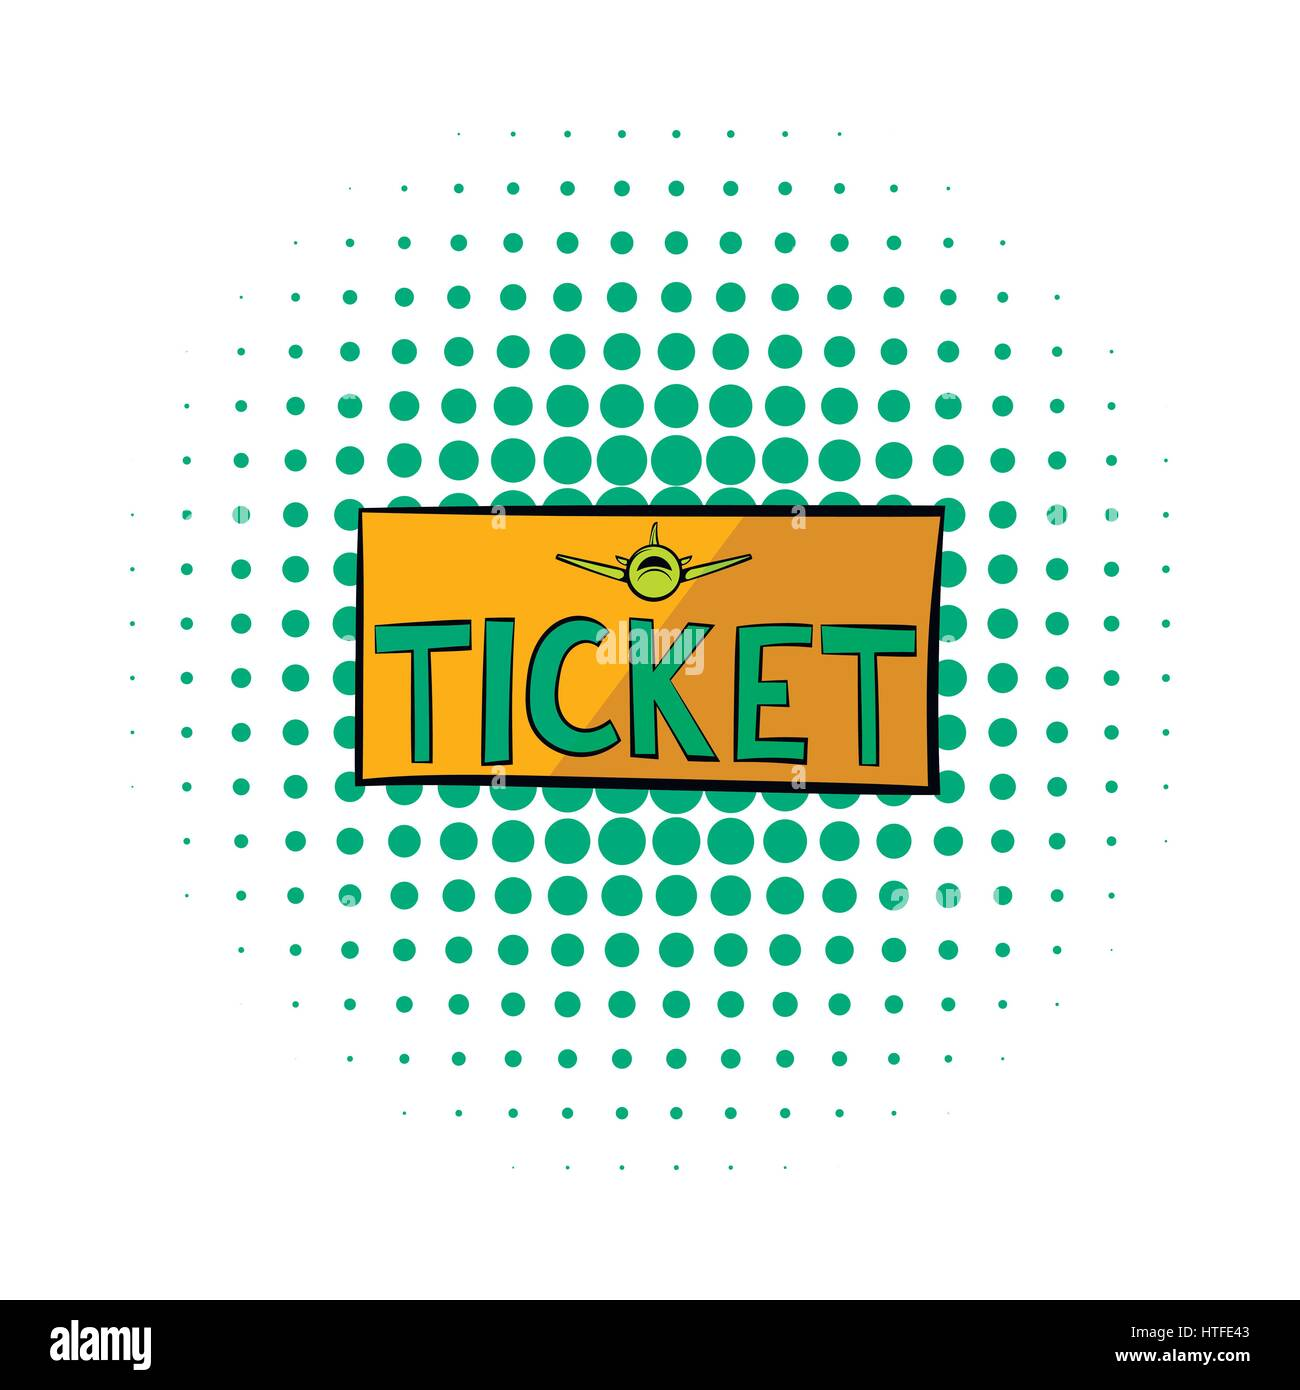 Plane tickets icon, comics style  - Stock Image